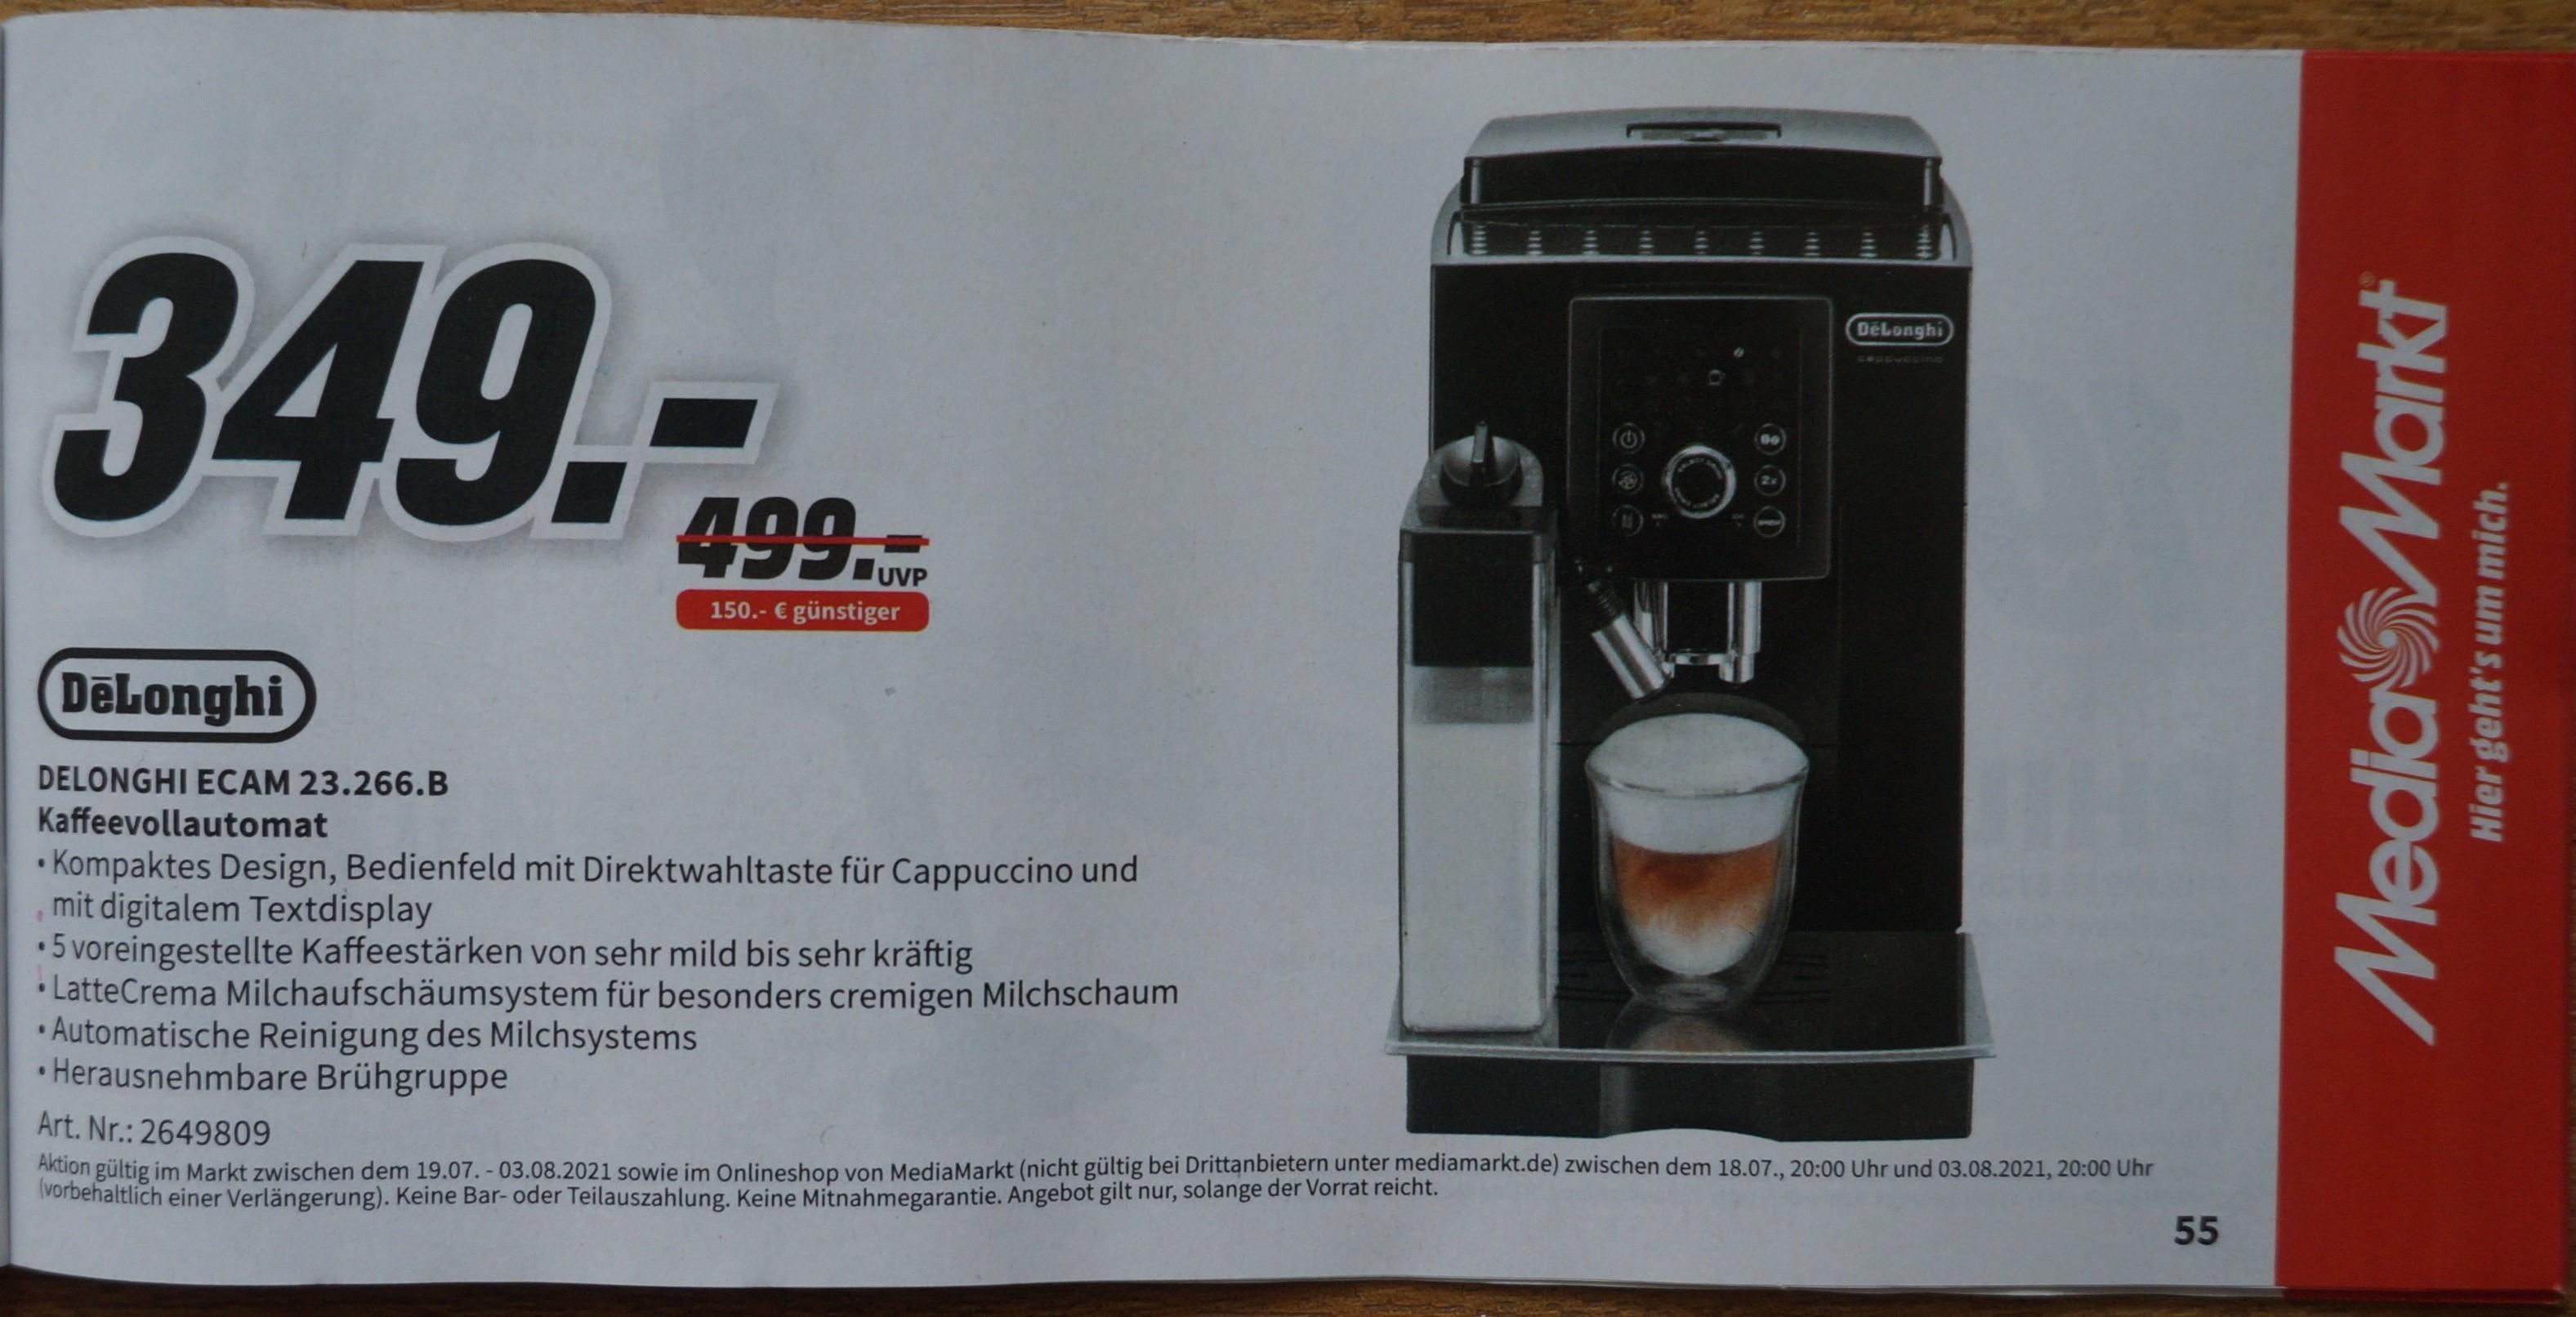 [Media Markt] Gutscheinheft: Rasierer / Staubsauger / Kaffevollautomat / Kleinelektro gültig 18.07.-03.08.2021 Delonghi ECAM 23.266.B